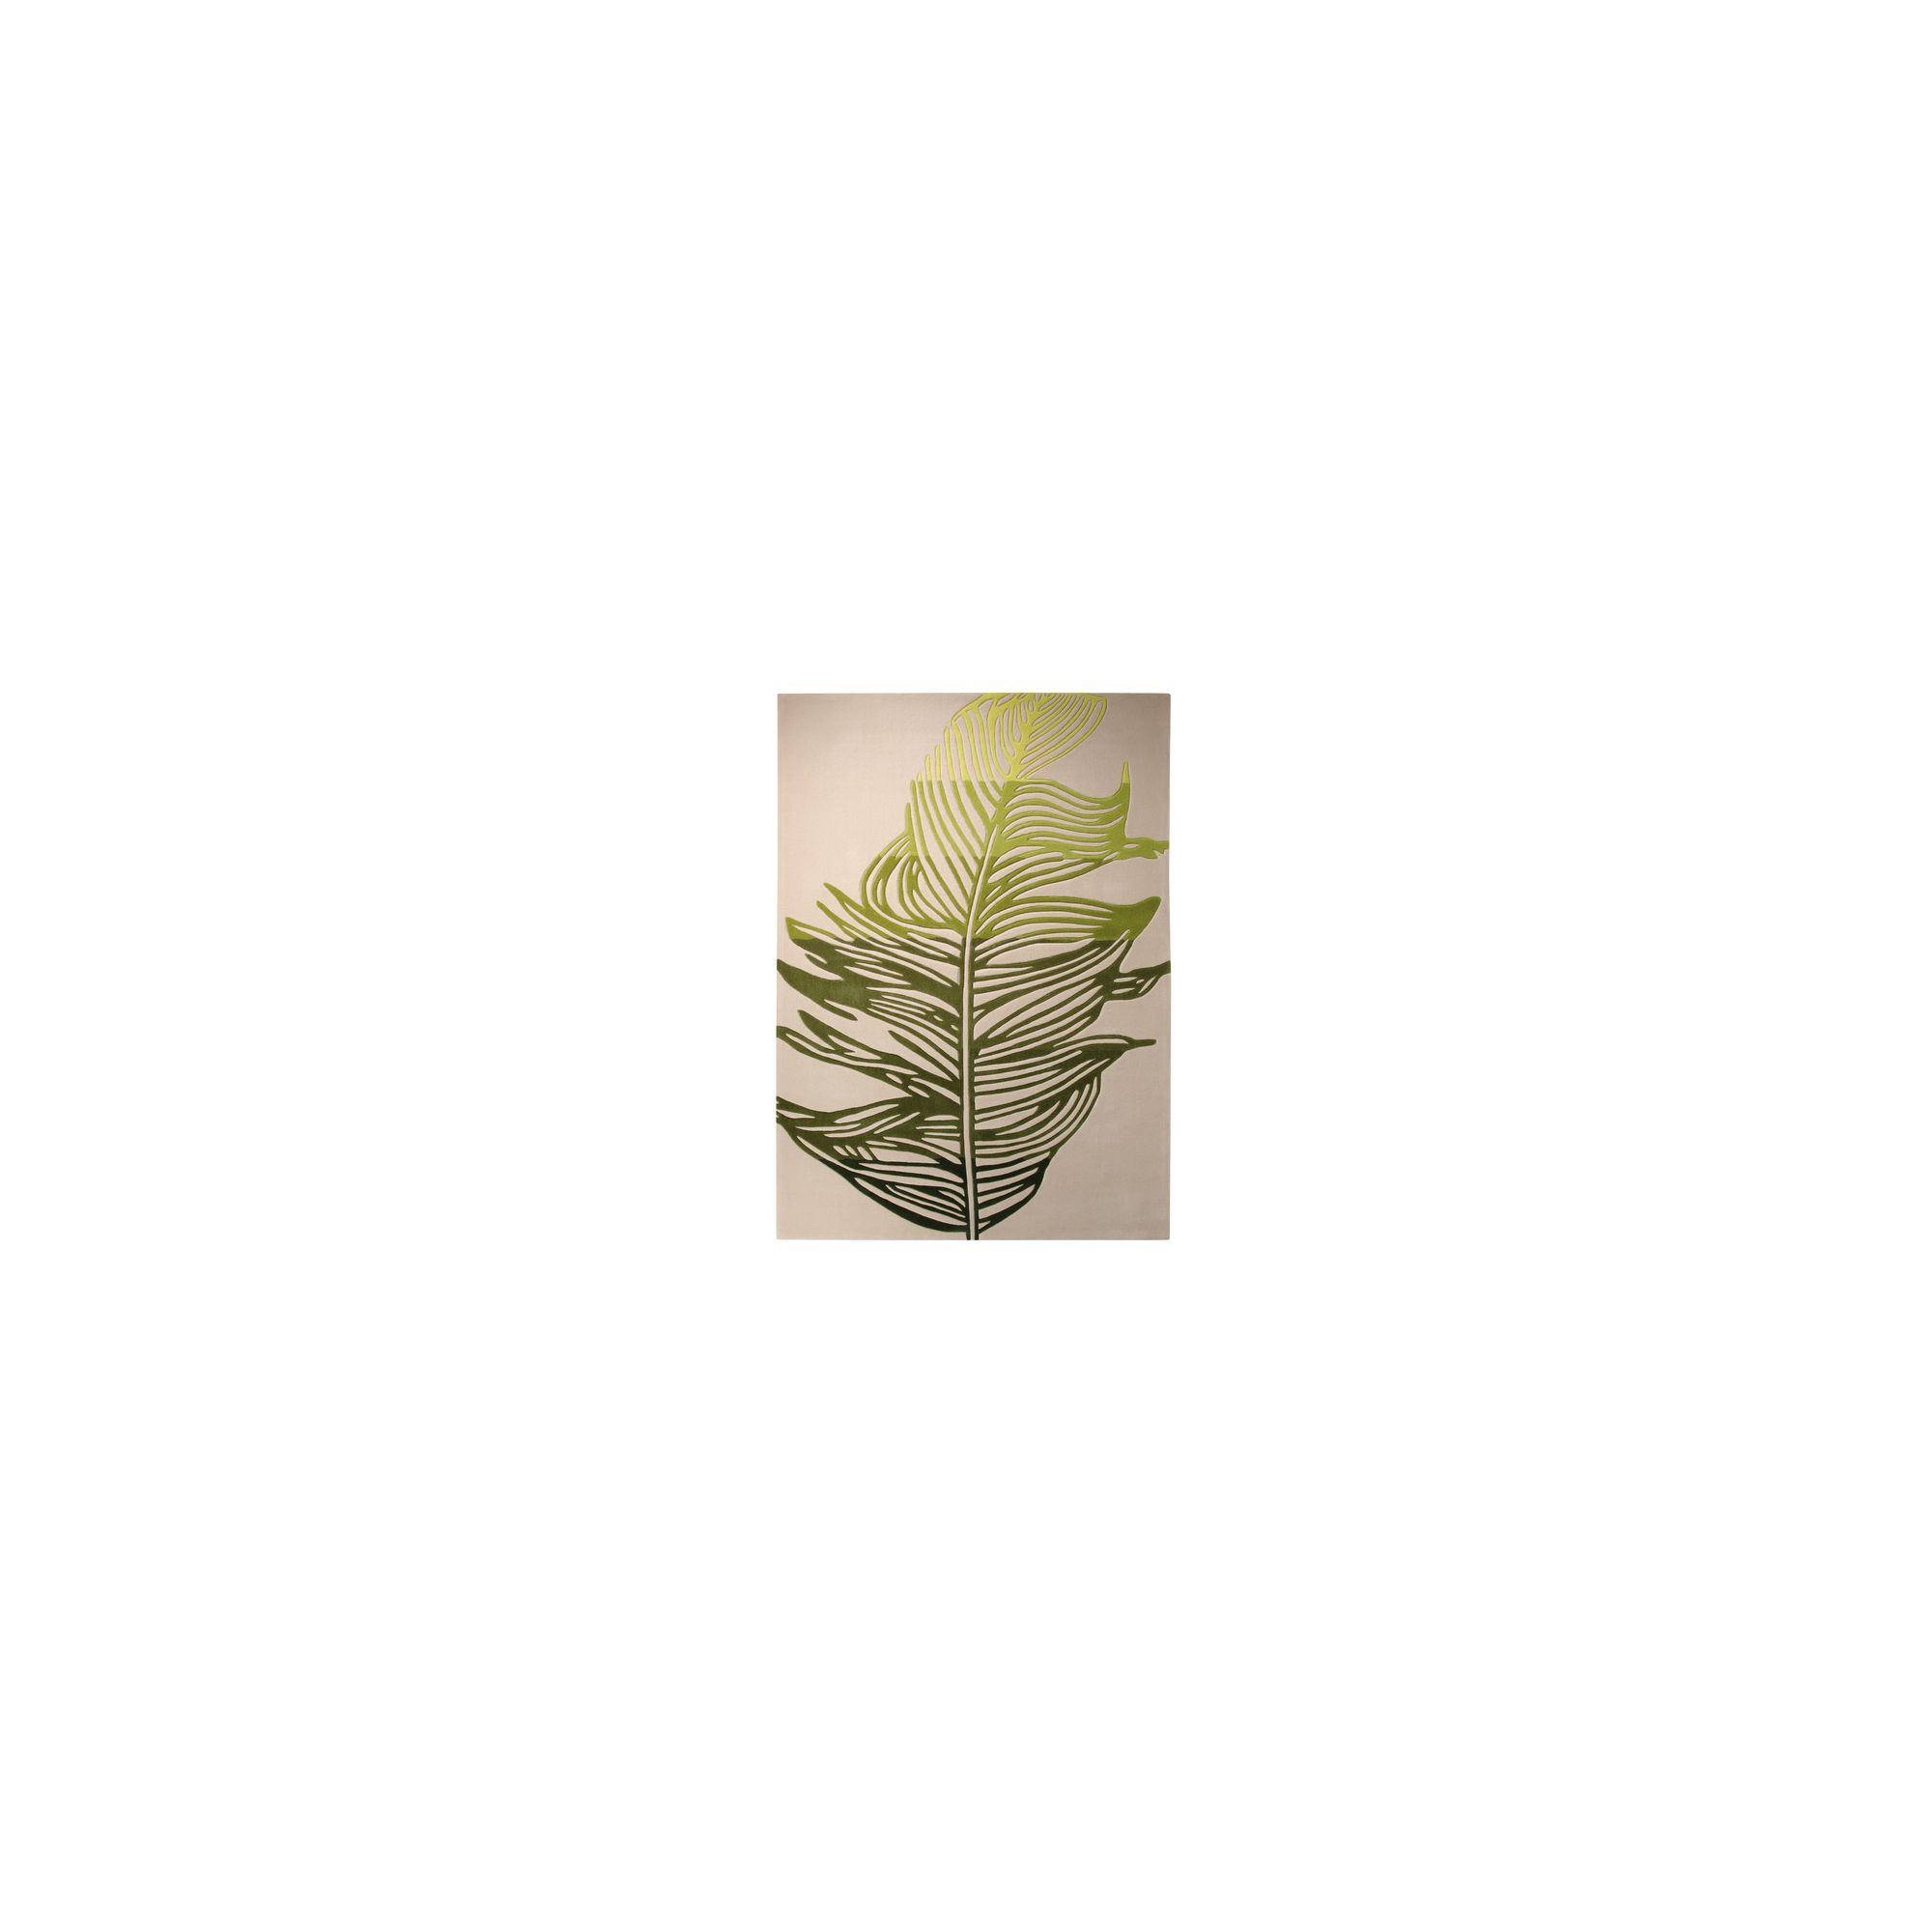 Esprit Feather Beige / Green Novelty Rug - 90cm x 160cm